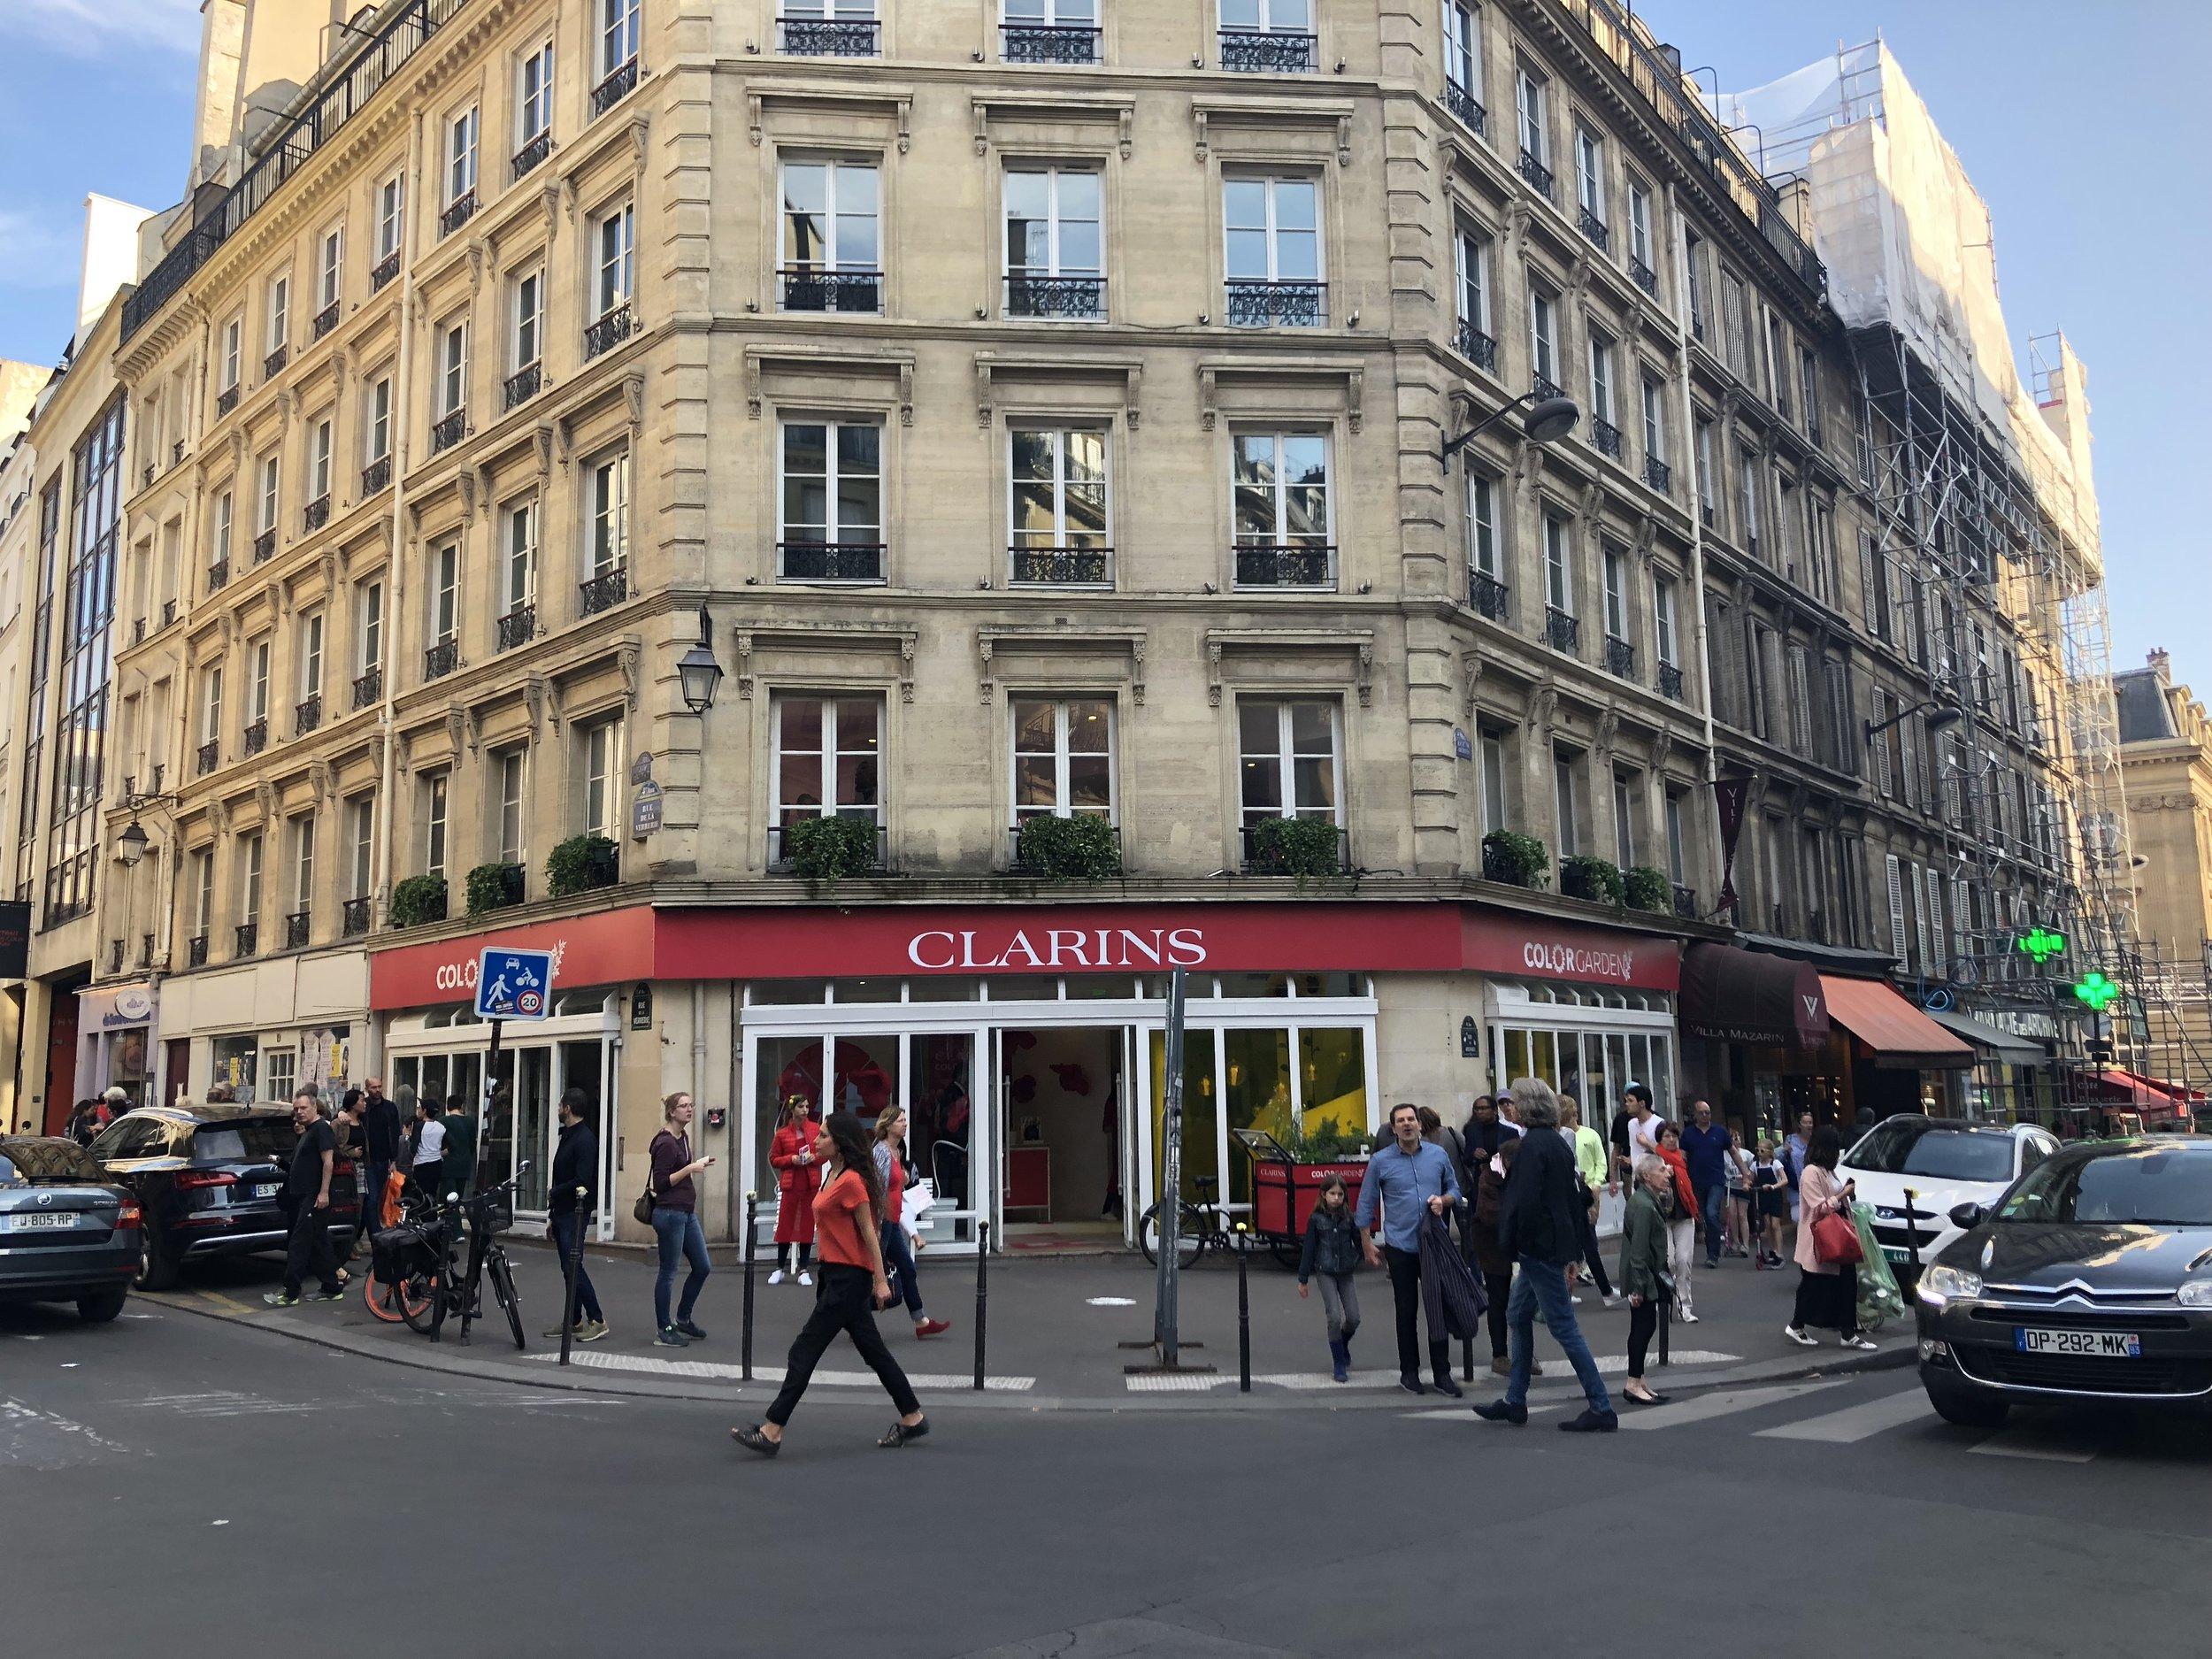 Pop-up-store-Clarins-elisa-les-bons-tuyaux.JPG